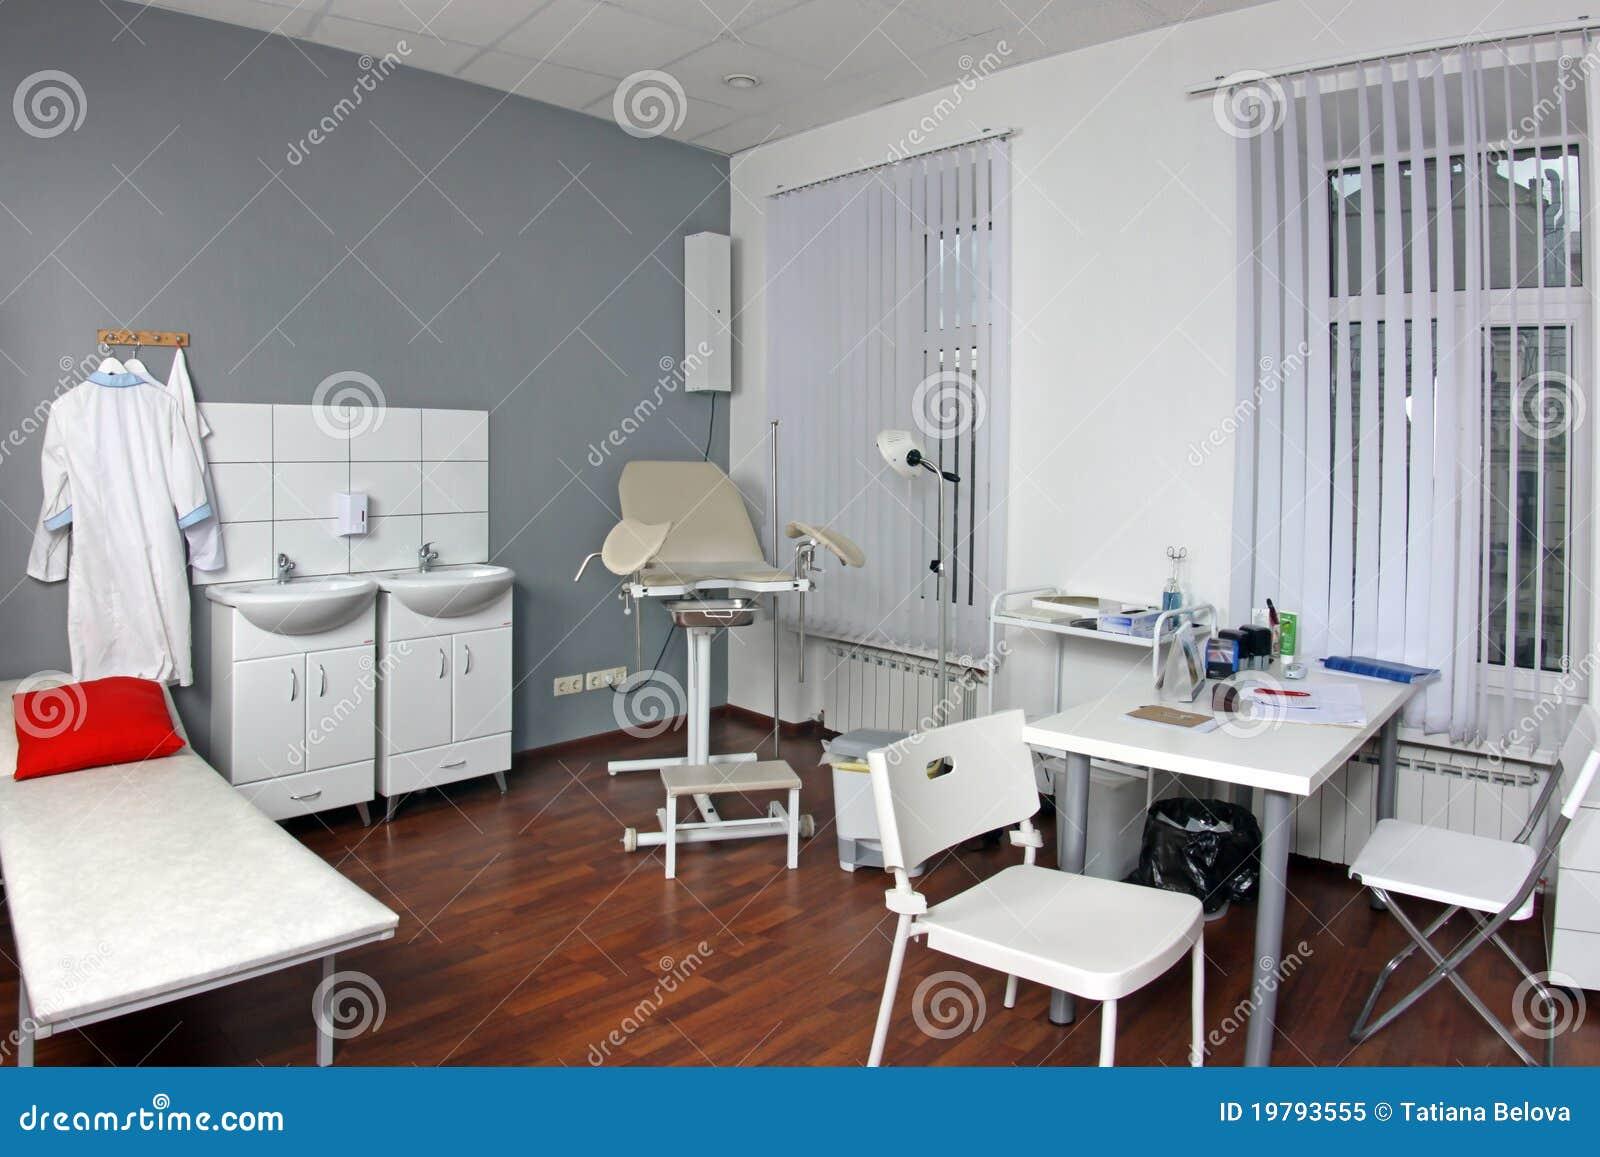 Фото кабинета гинеколога 10 фотография